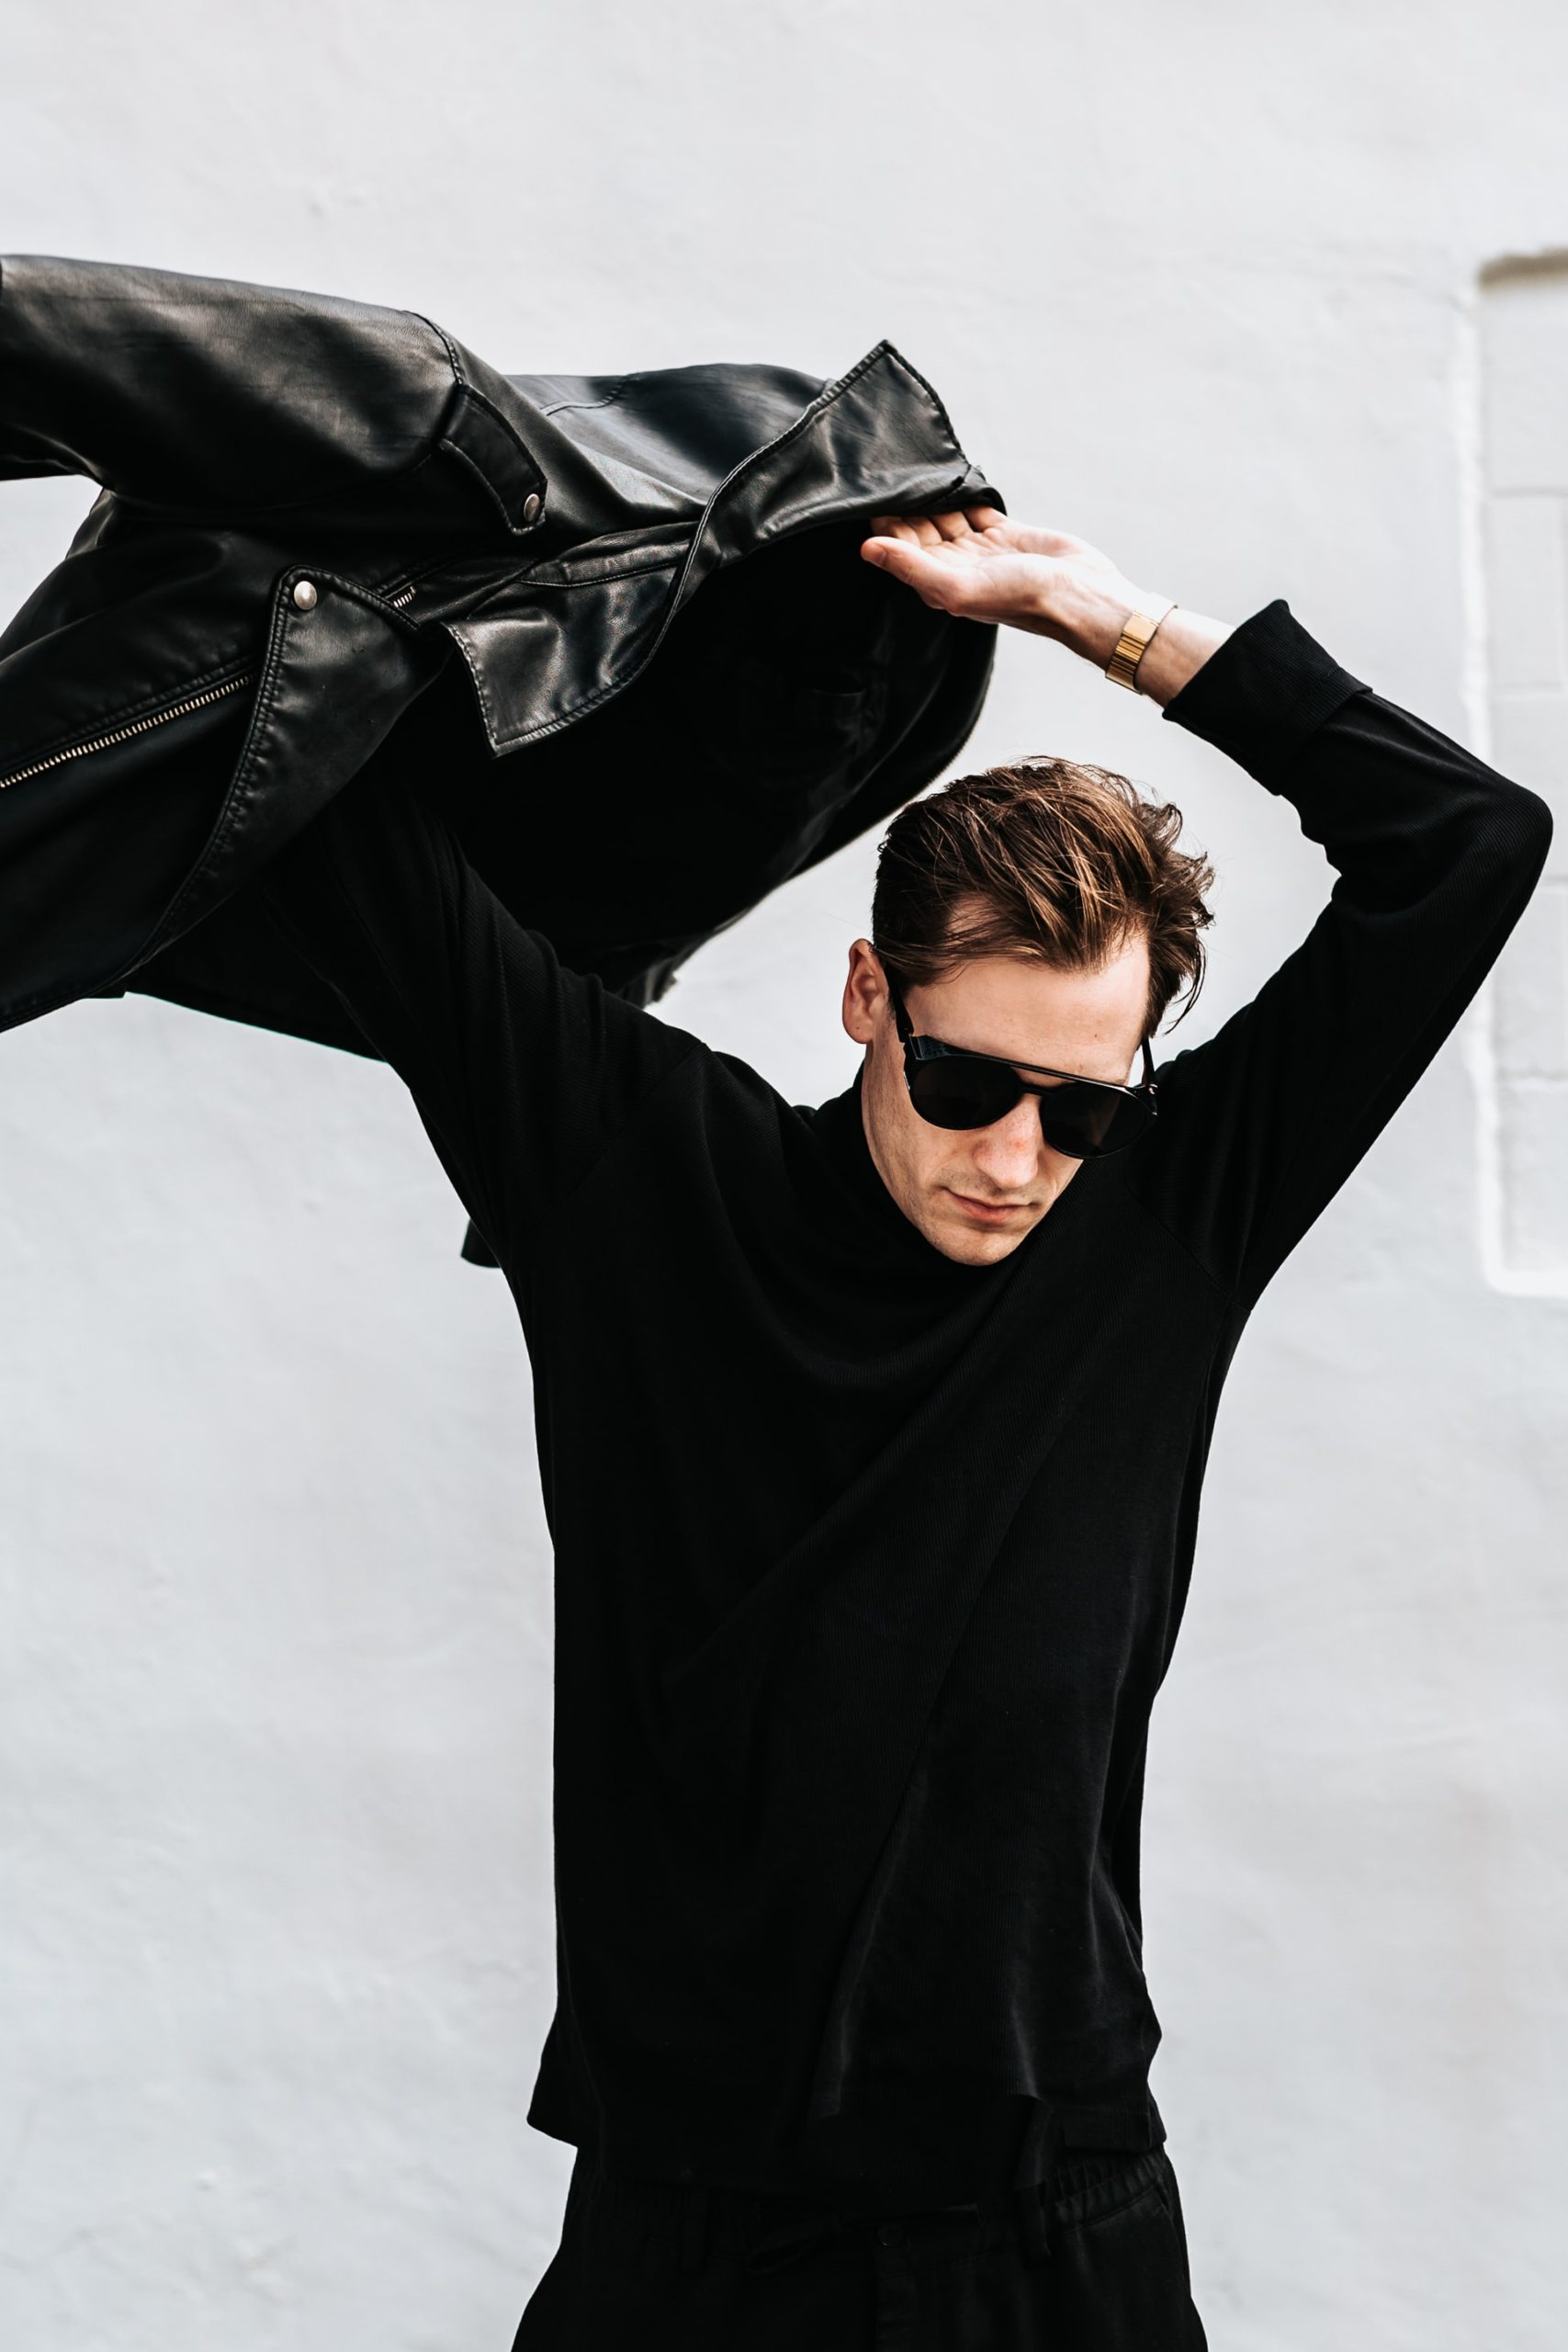 Leather Jacket Tips Article Image